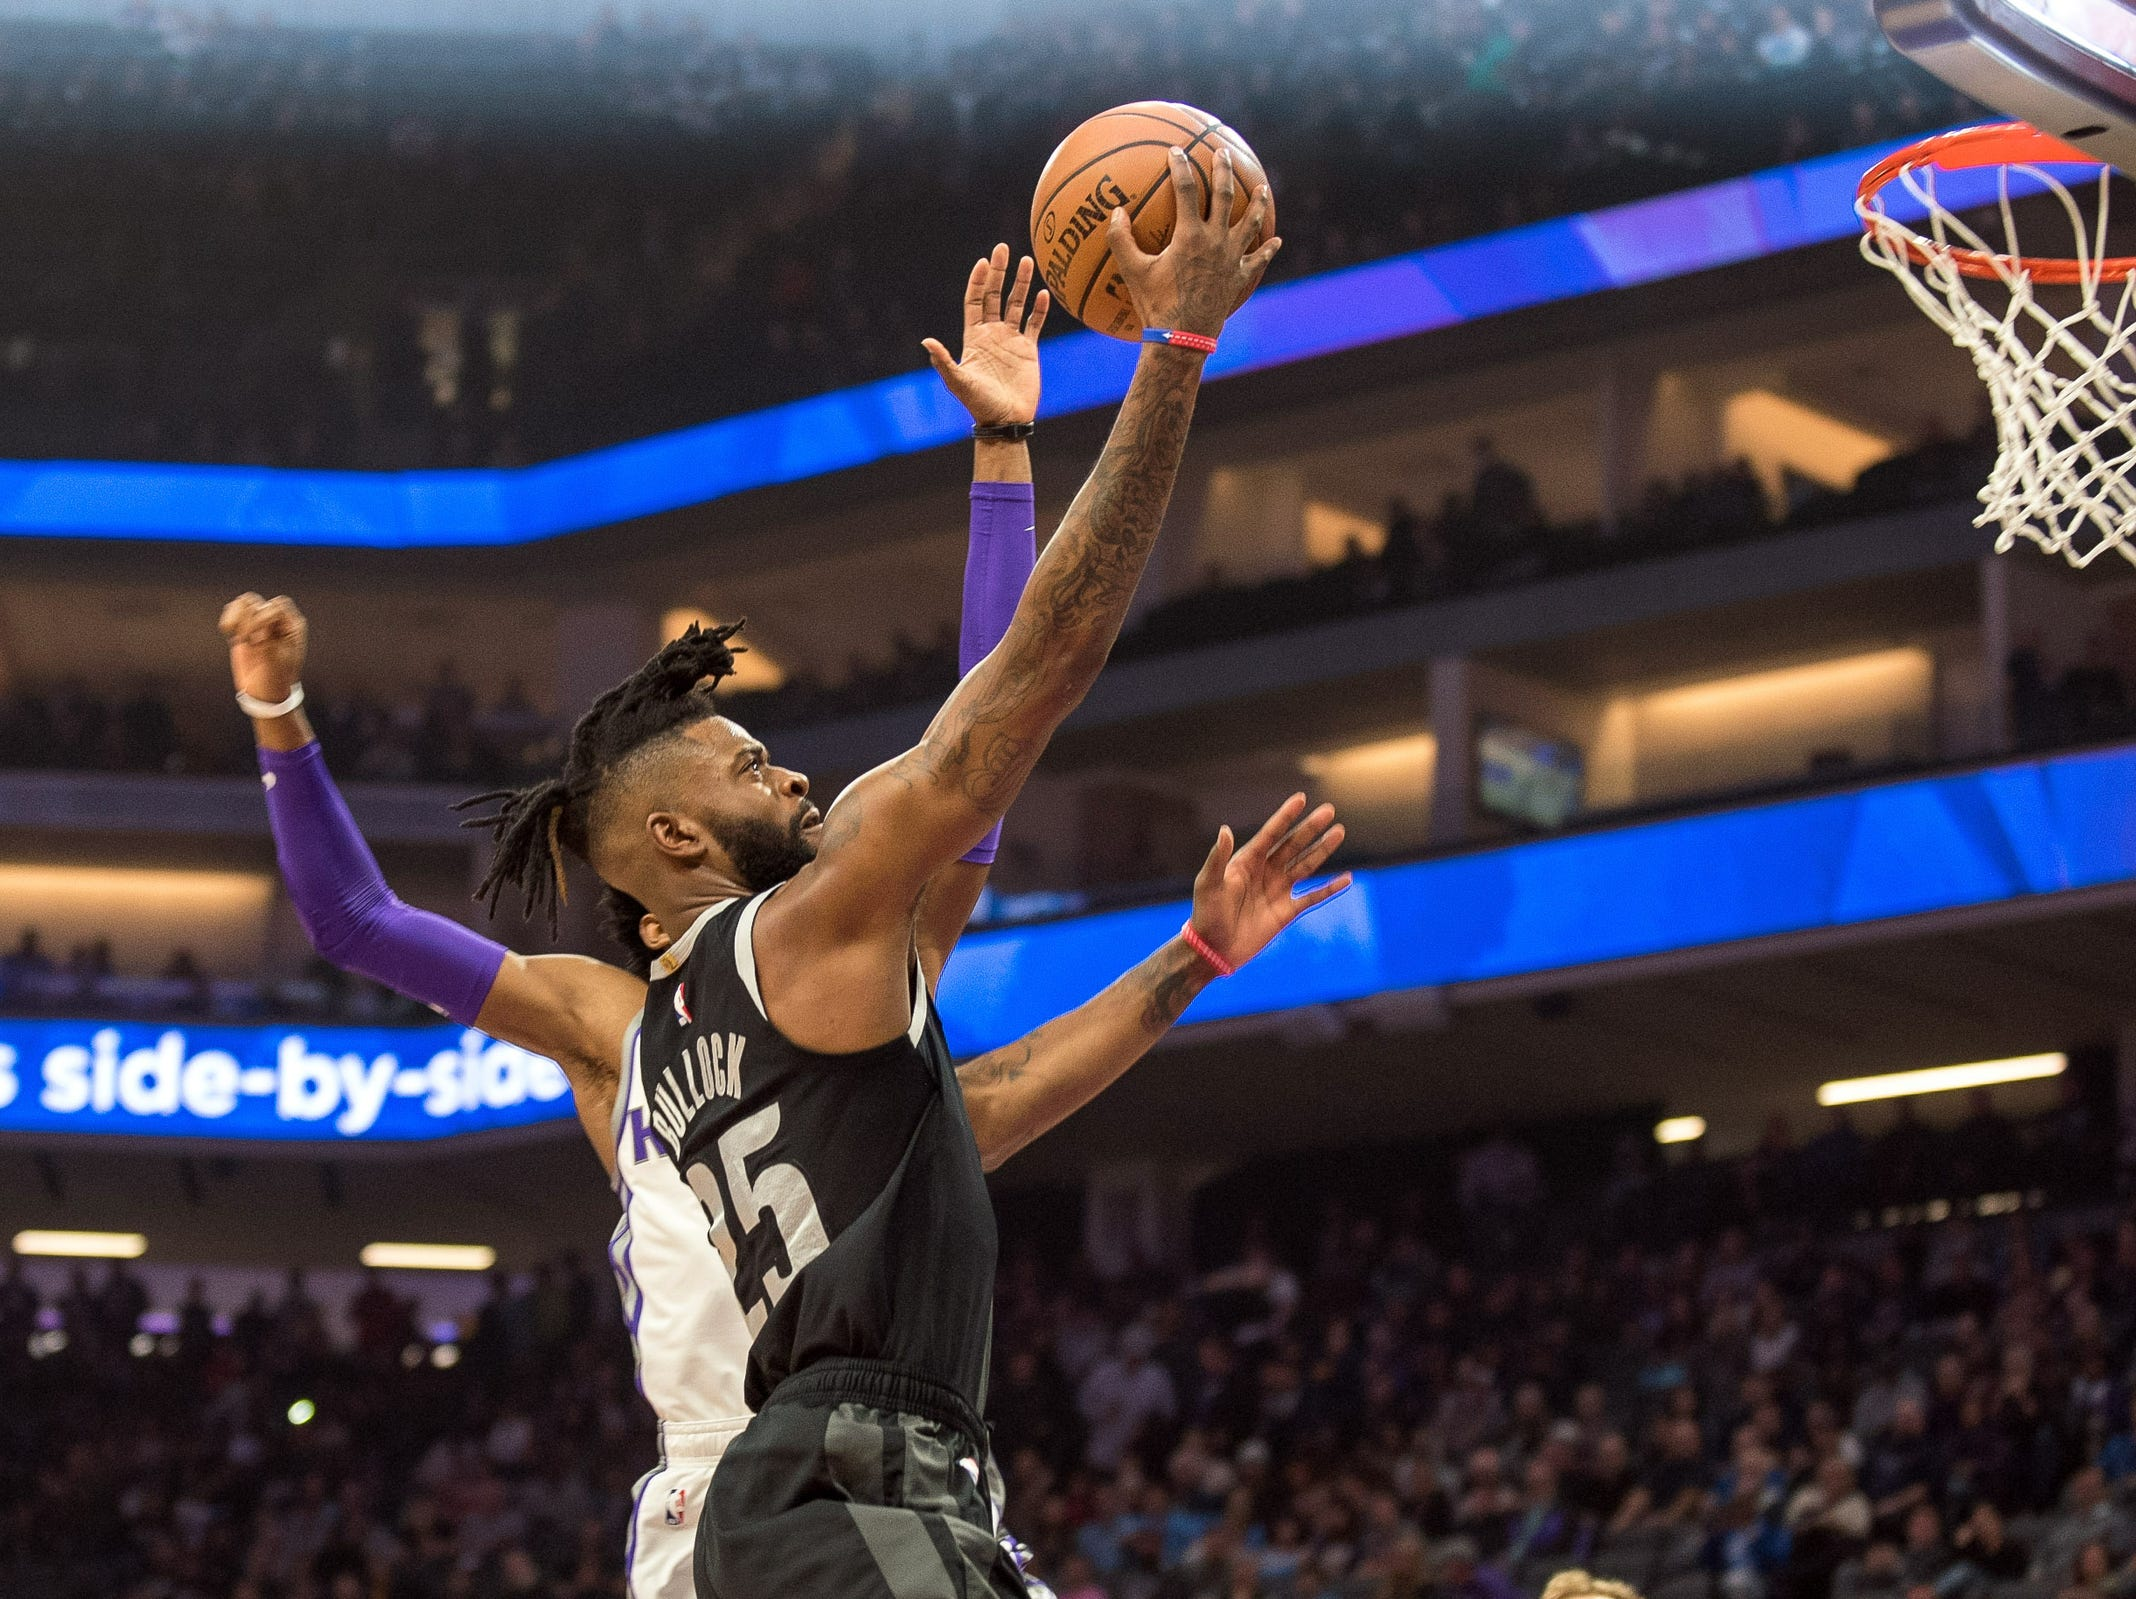 Detroit Pistons guard Reggie Bullock (25) goes up for the shot against the Sacramento Kings during the first quarter at Golden 1 Center on Thursday, Jan. 10, 2019, in Sacramento, Calif.